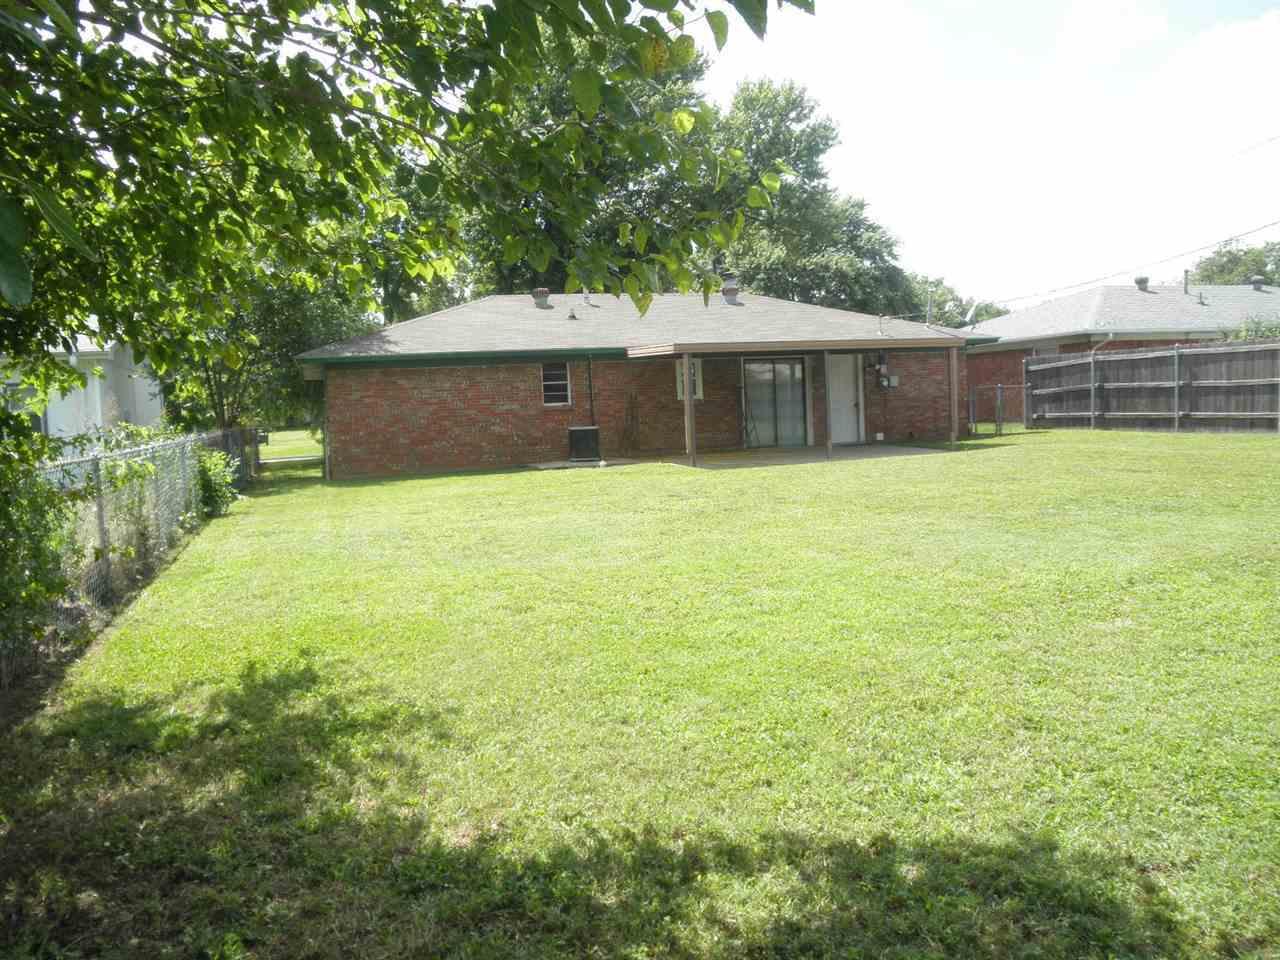 Sold Intraoffice W/MLS | 1209 N Ash Ponca City, OK 74601 14